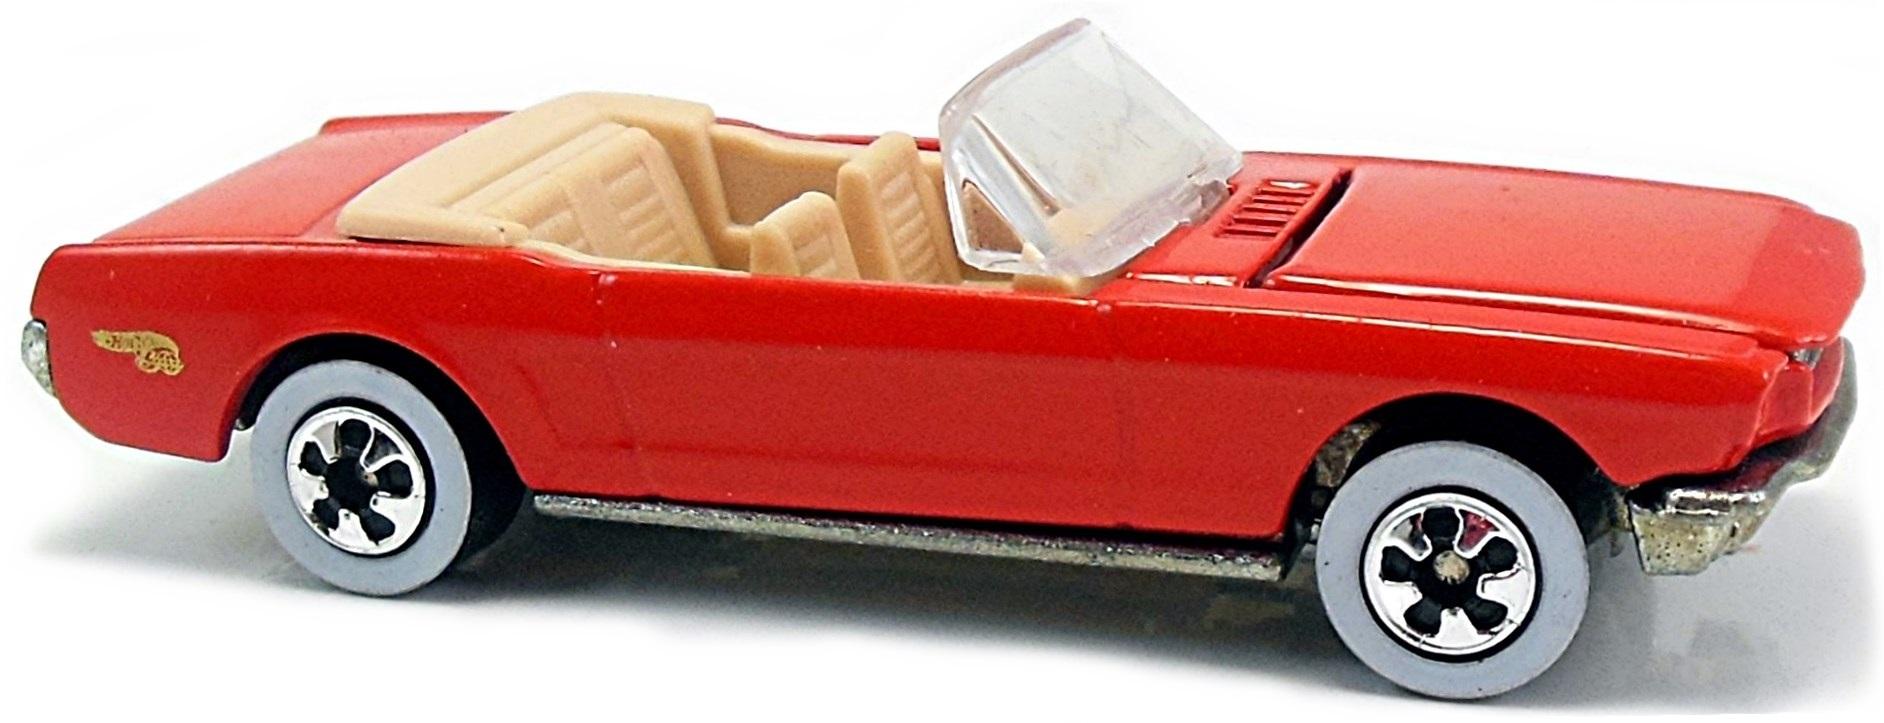 All Types 1995 mustang convertible : 65 Mustang Convertible – 87mm – 1984 | Hot Wheels Newsletter